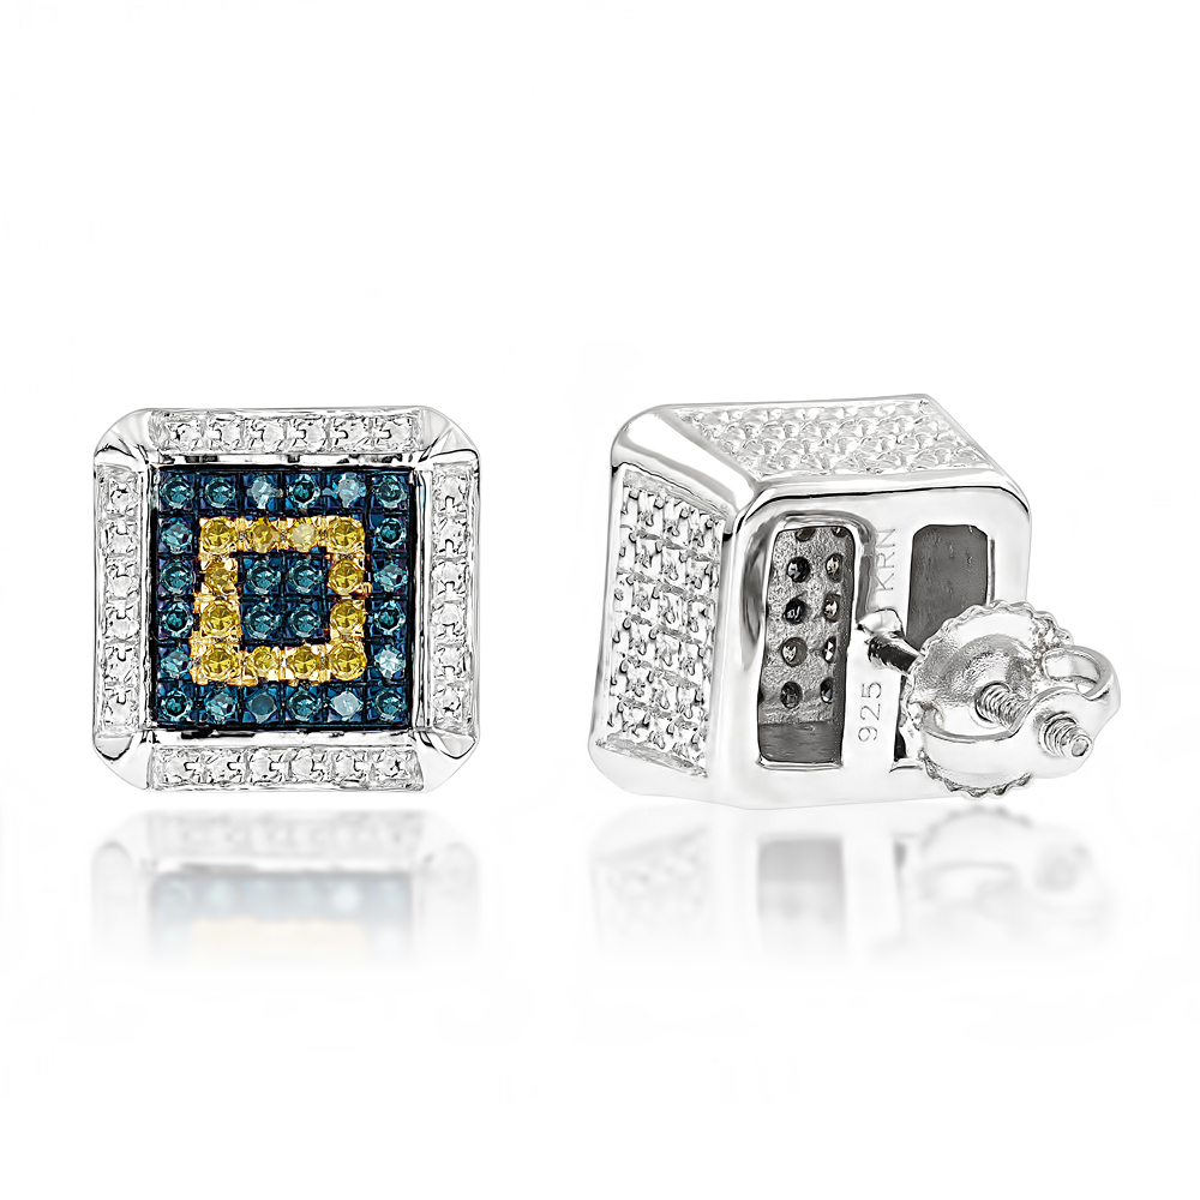 Square Sterling Silver Diamond Earrings Studs 0.35ct Yellow Blue Diamonds